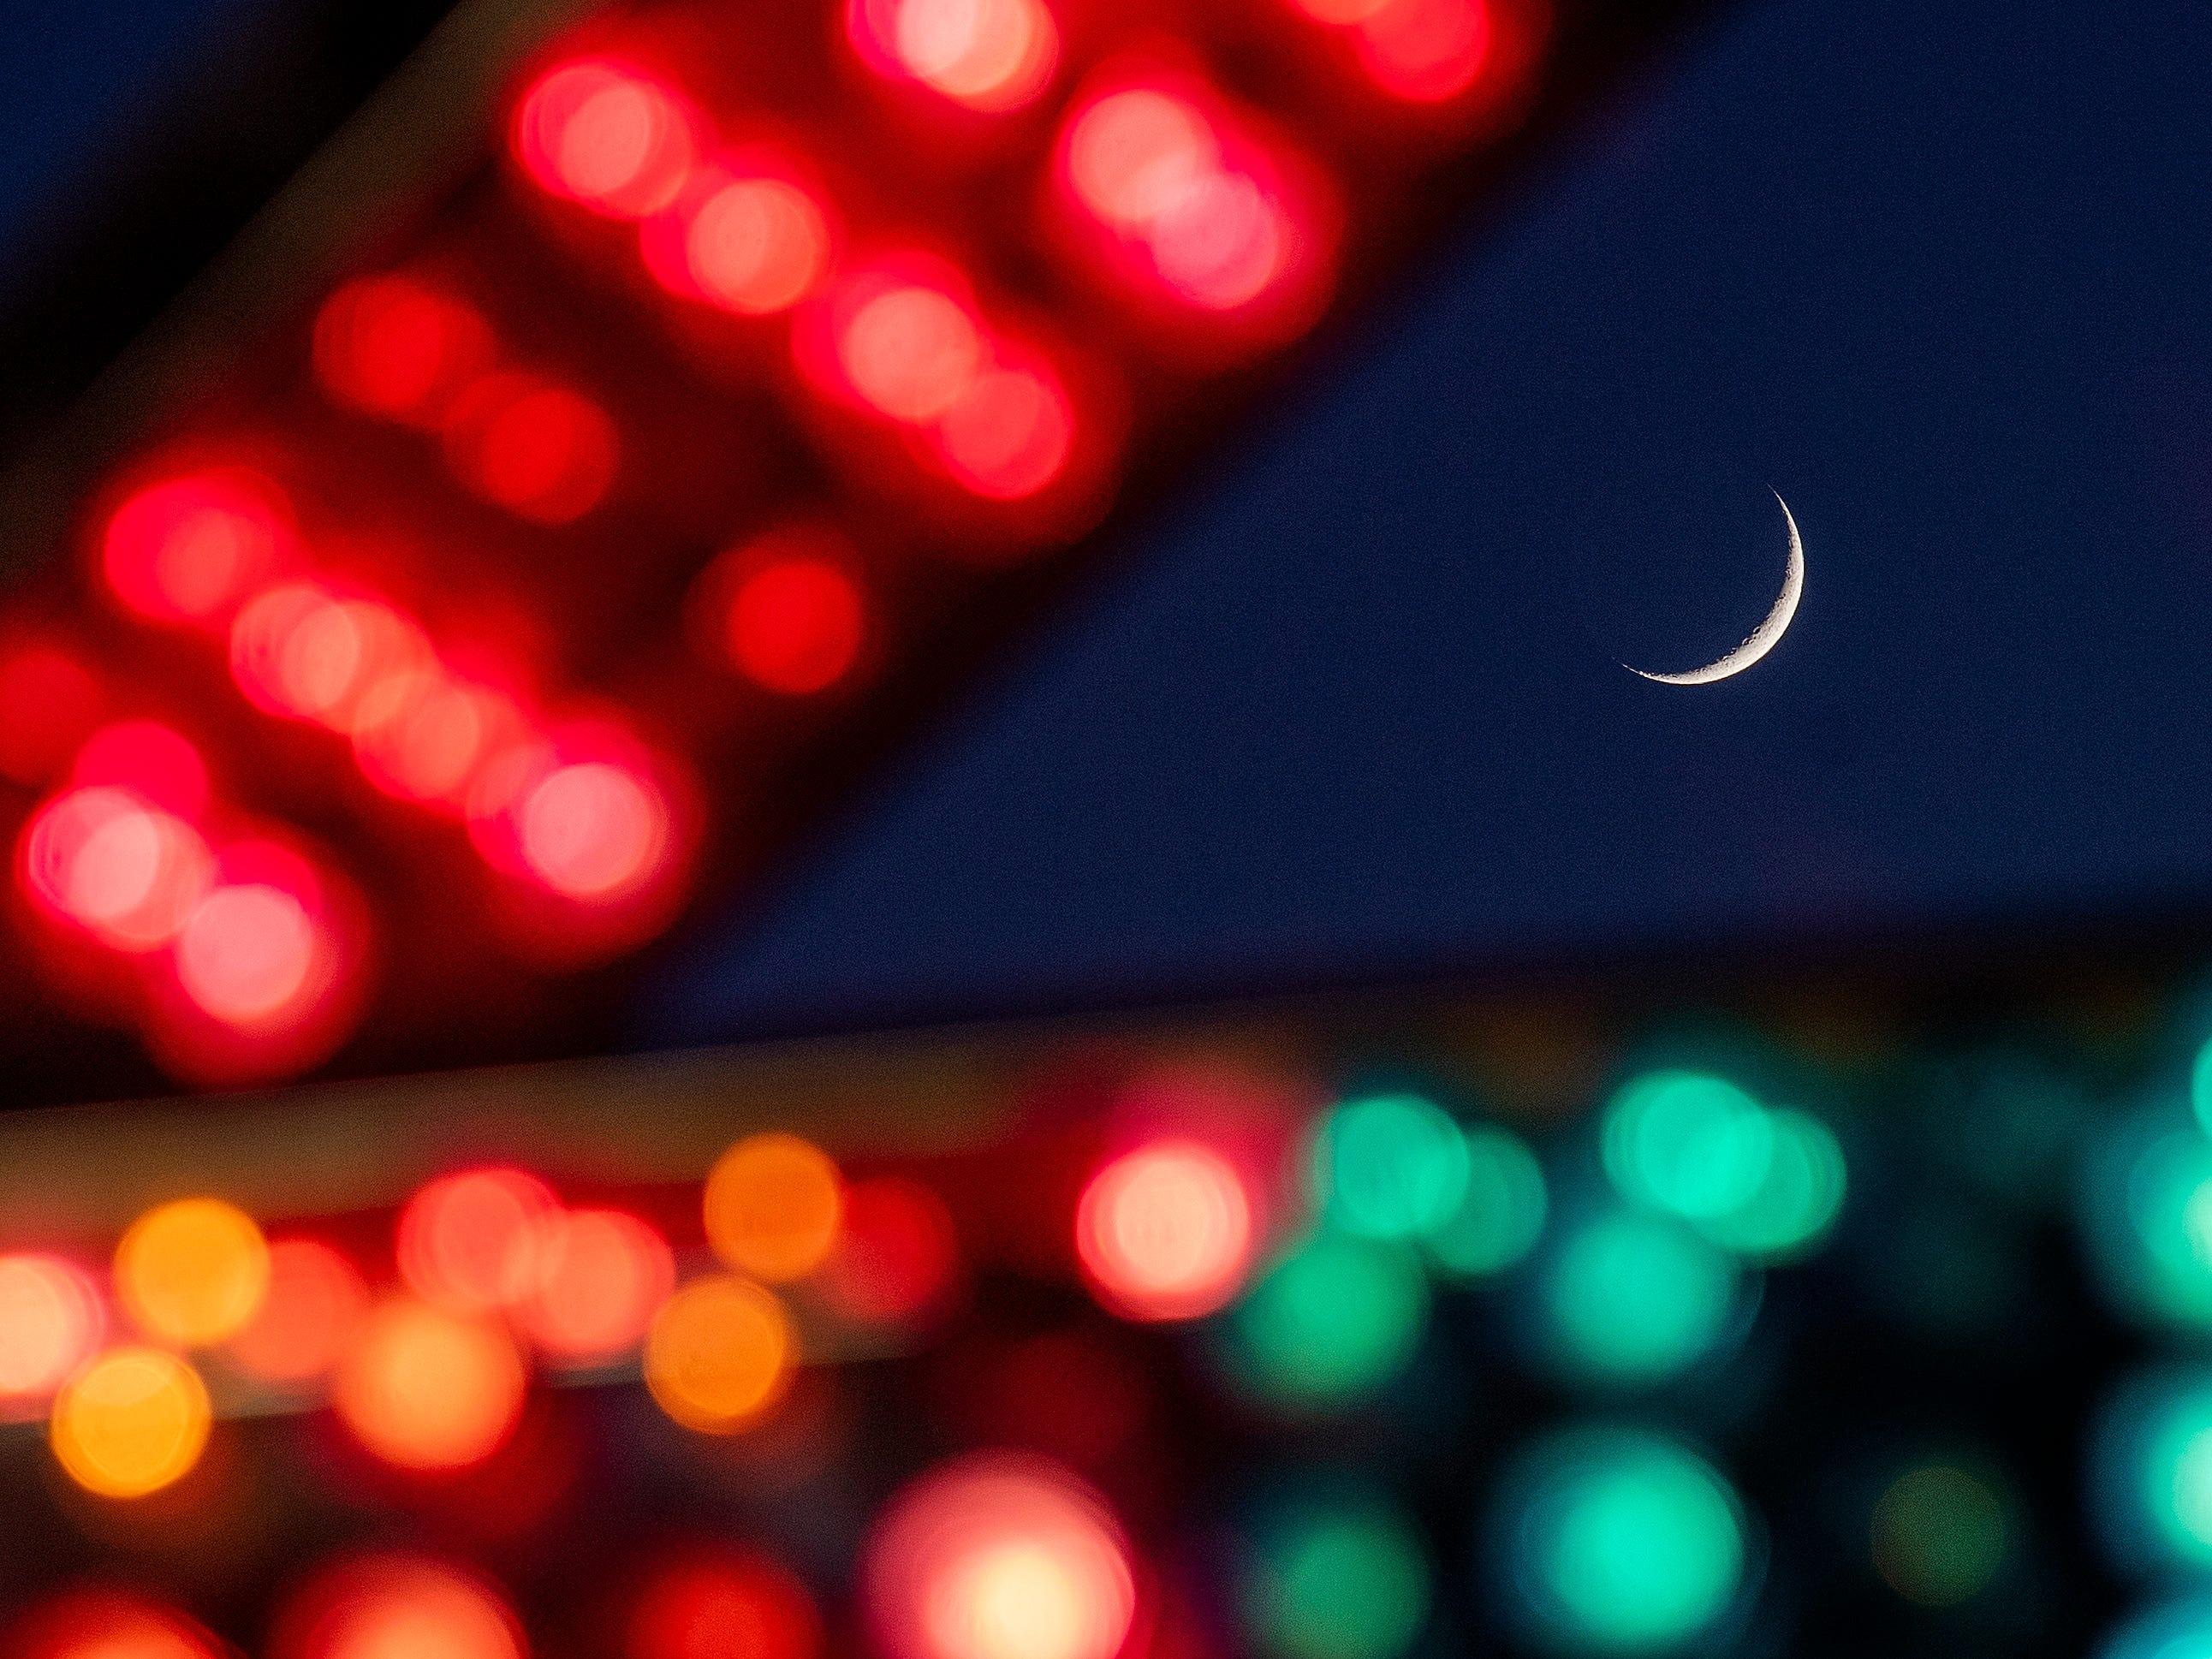 The crescent moon rises as families enjoy the Autauga County Fair in Prattville, Ala., on Thursday evening October 11, 2018. The fair runs through Saturday the 13th.